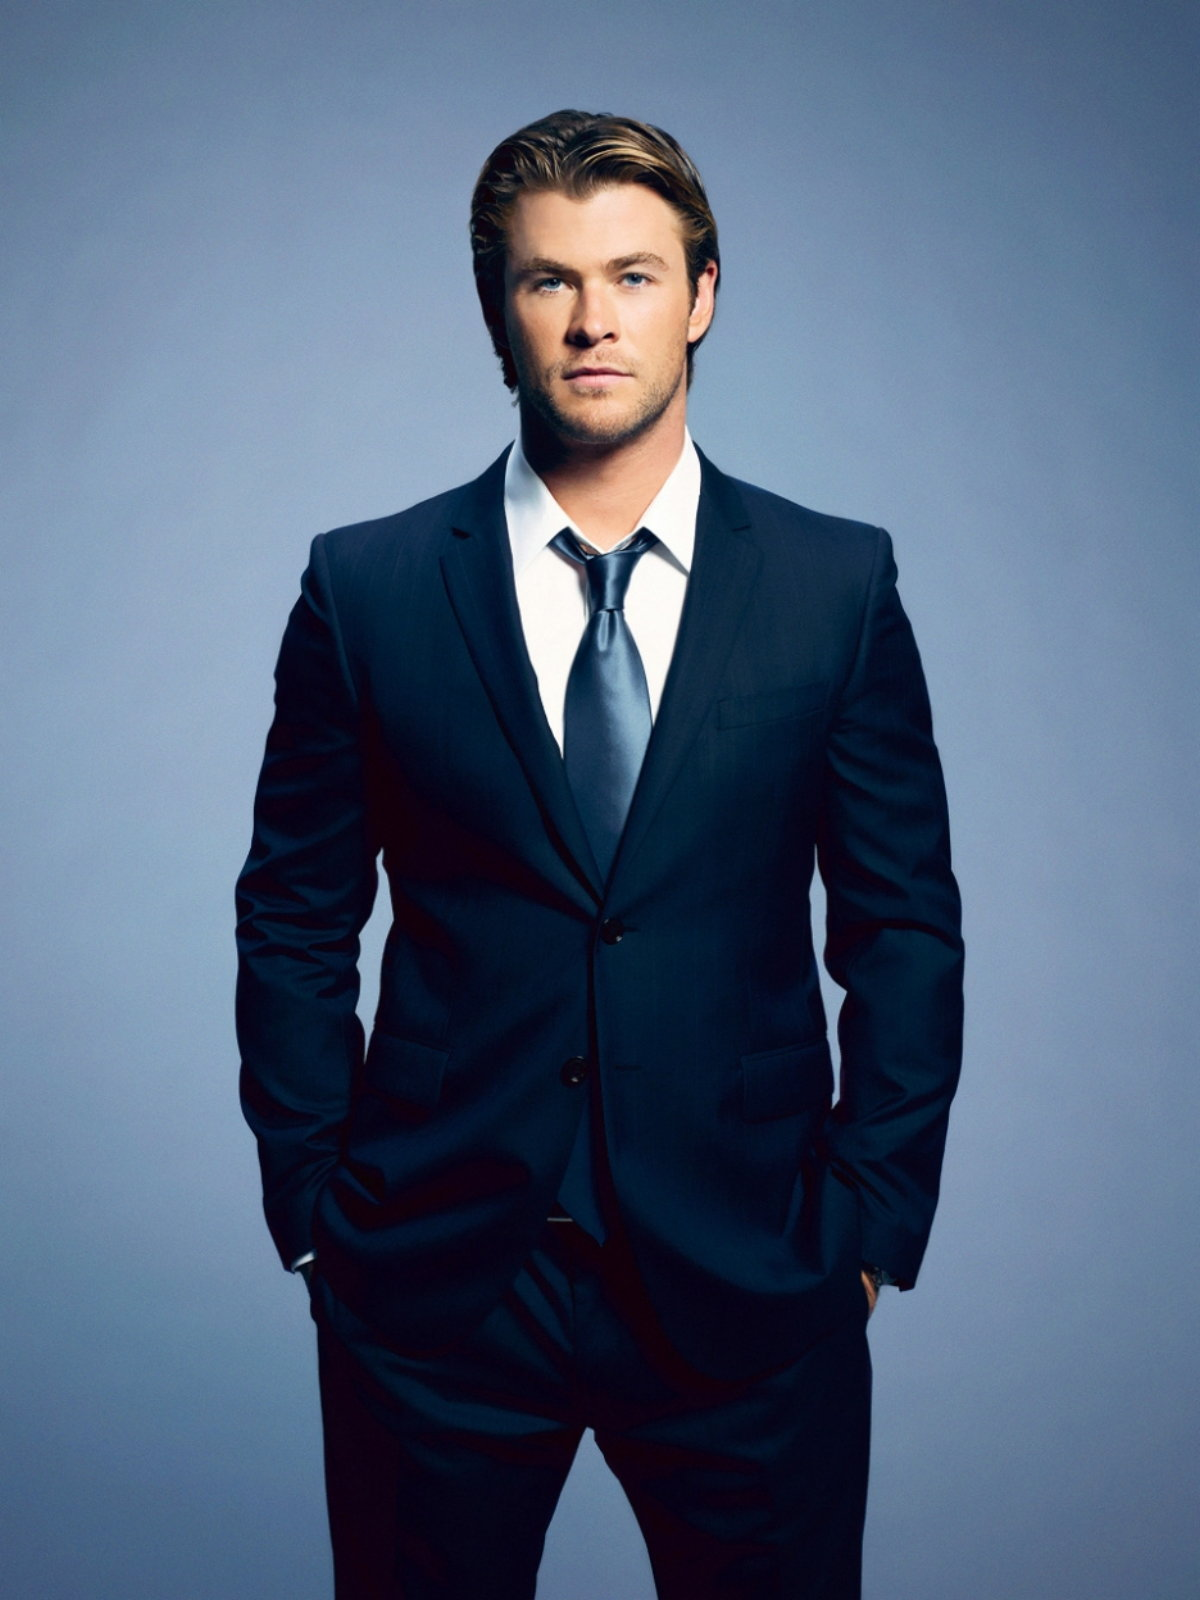 Chris Hemsworth images...